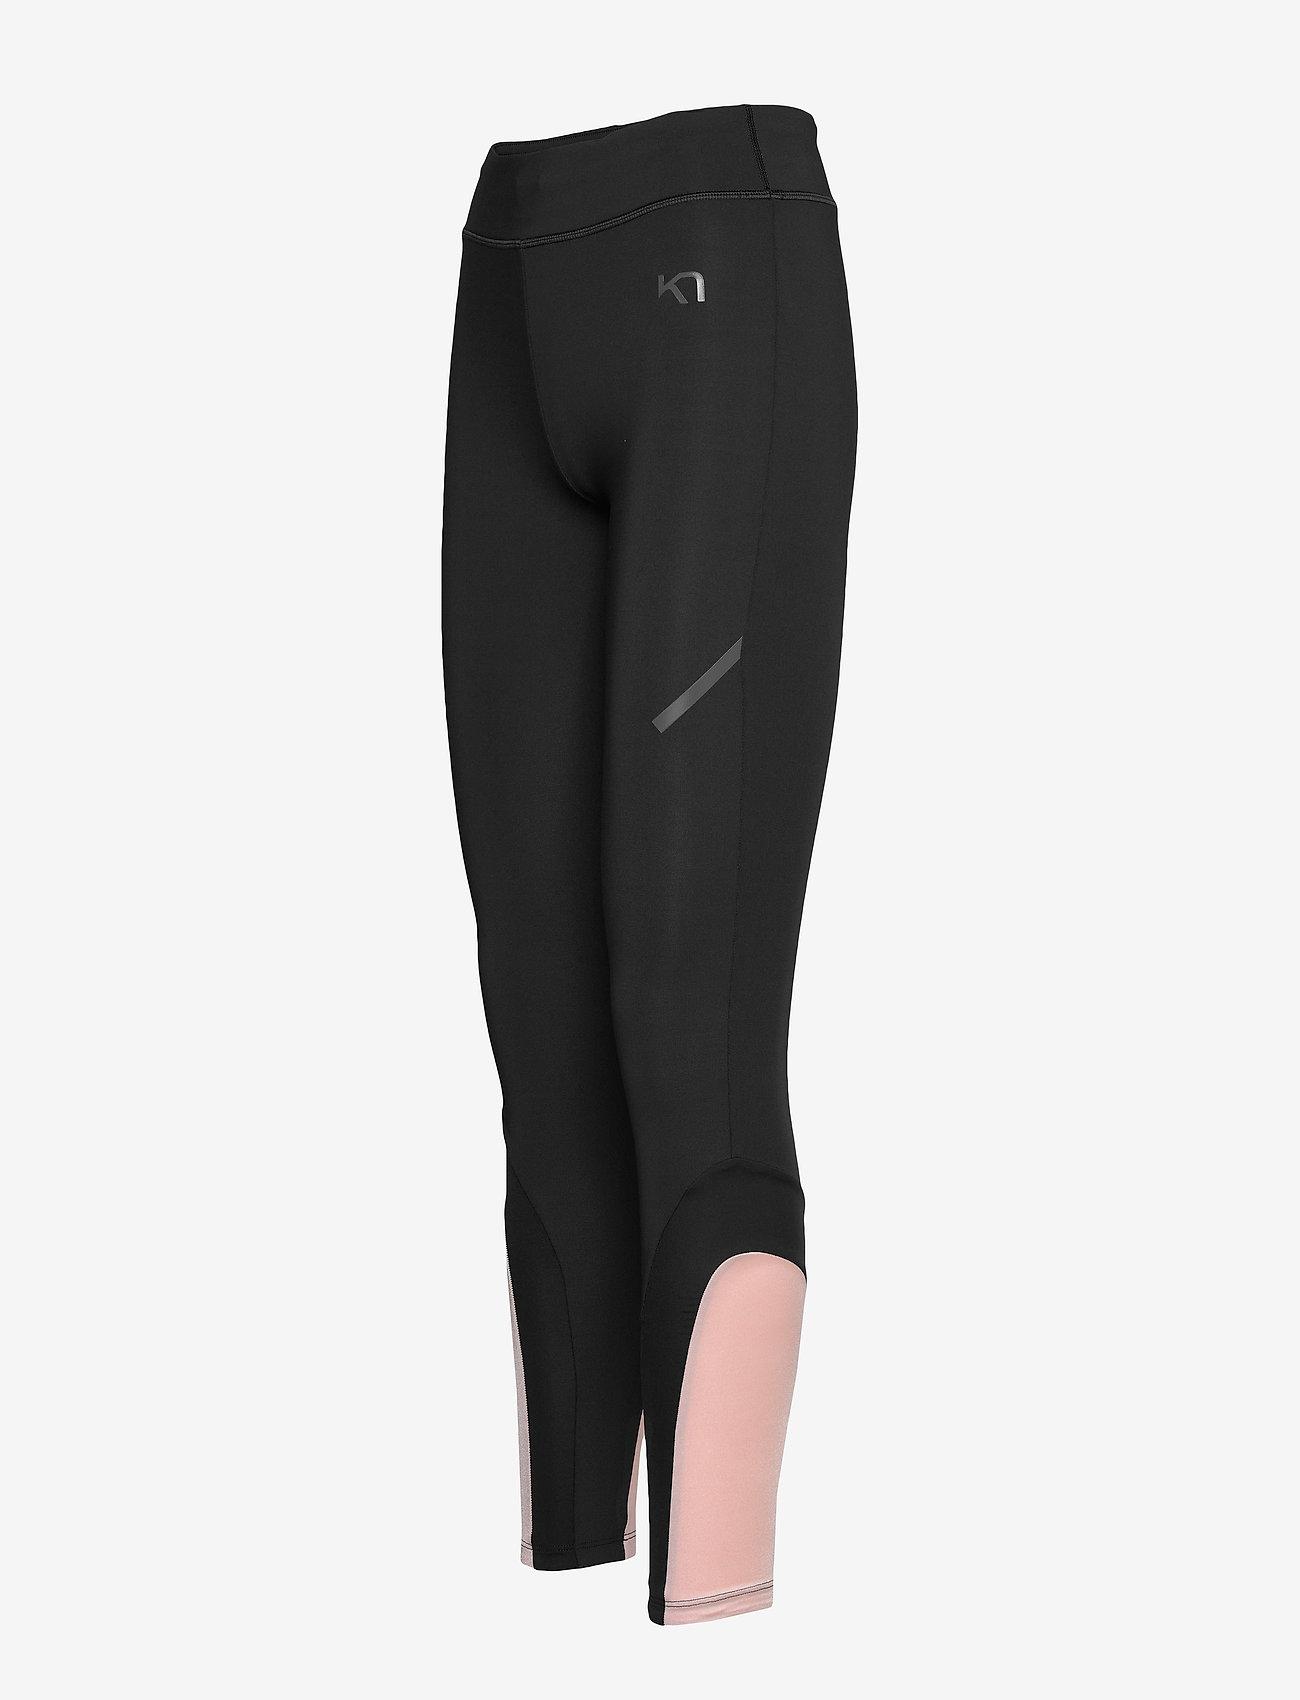 Kari Traa CAROLINE TIGHTS - Leggings & tights BLACK - Dametøj Særtilbud